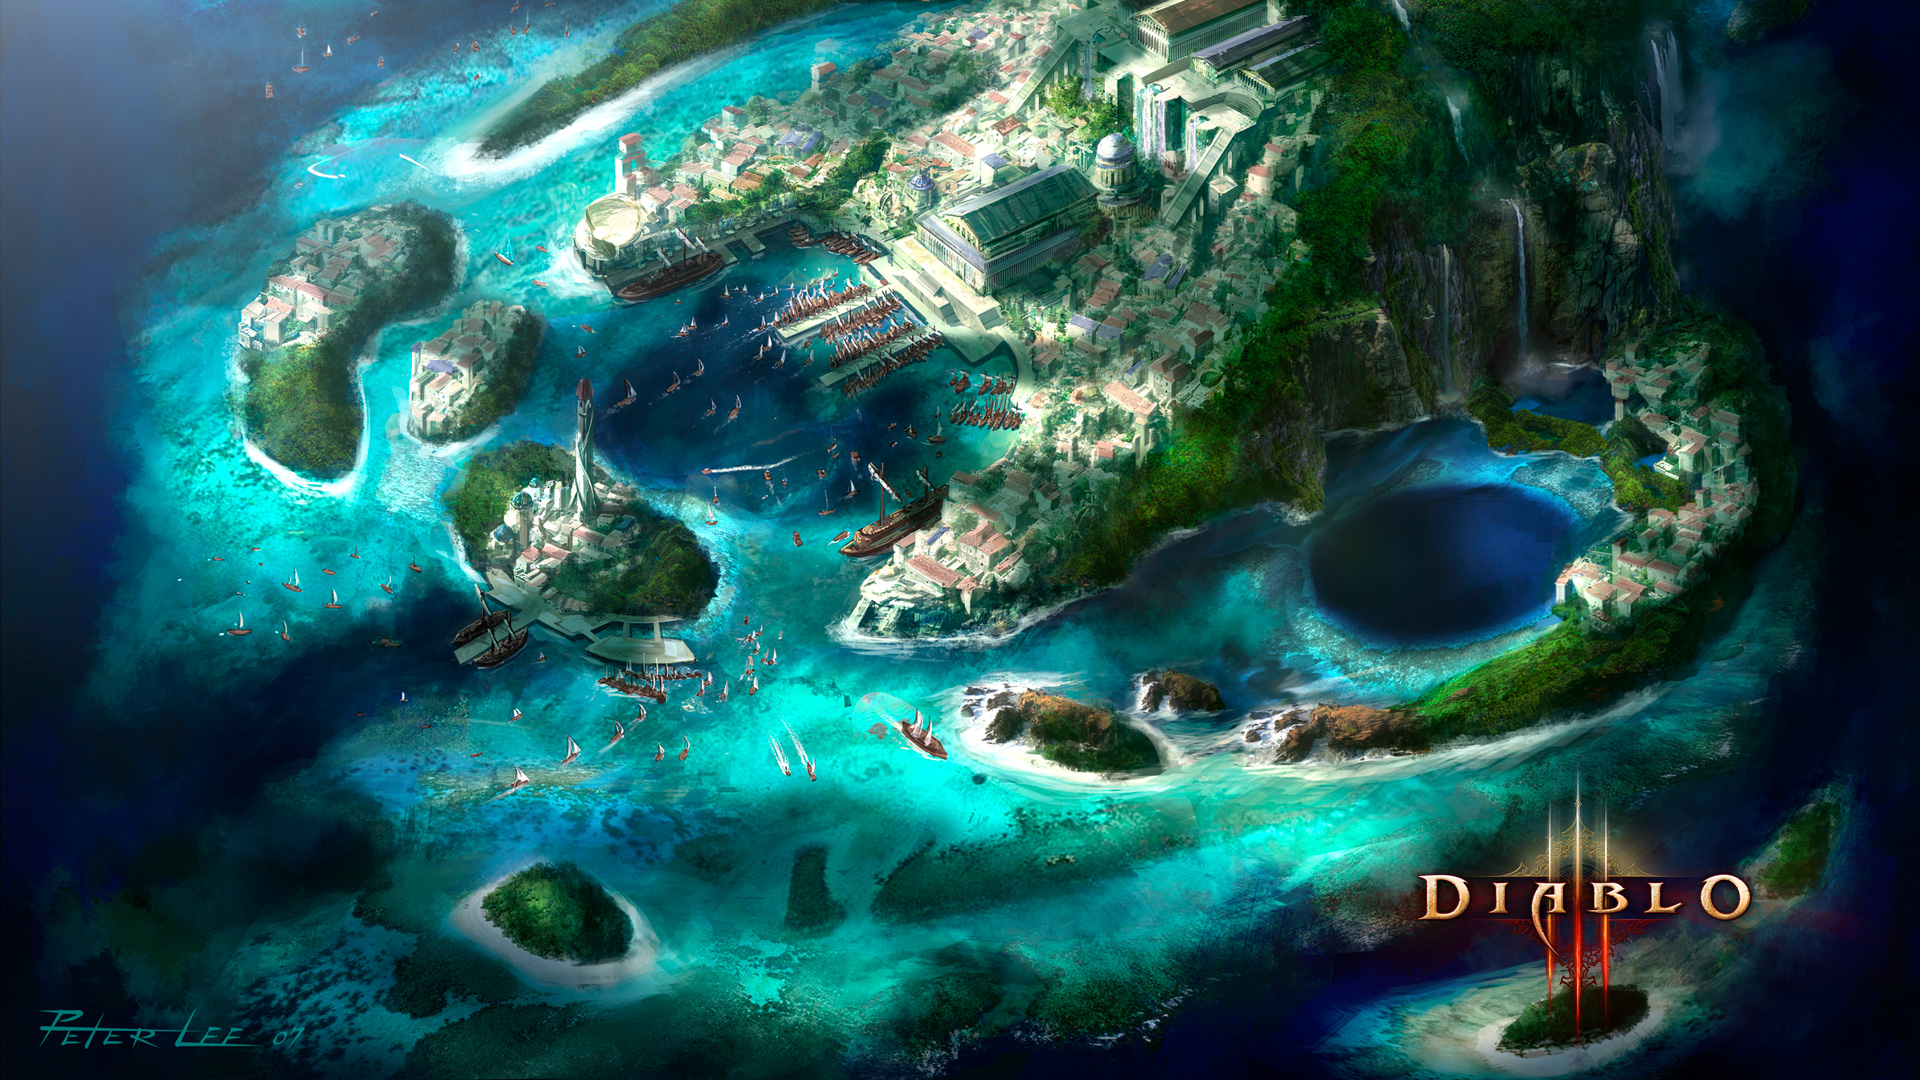 Diablo 3 wallpaper 37